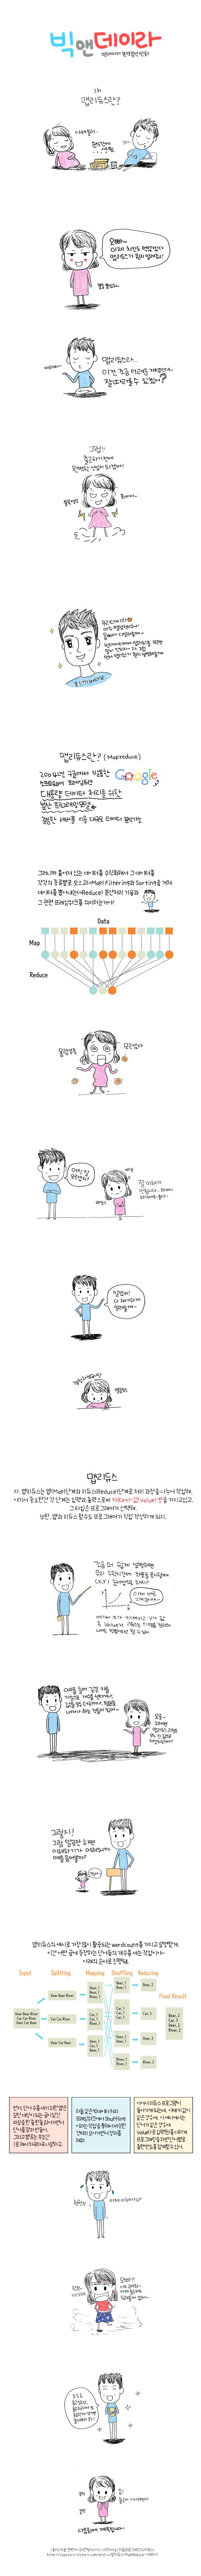 bigdata_cartoon2